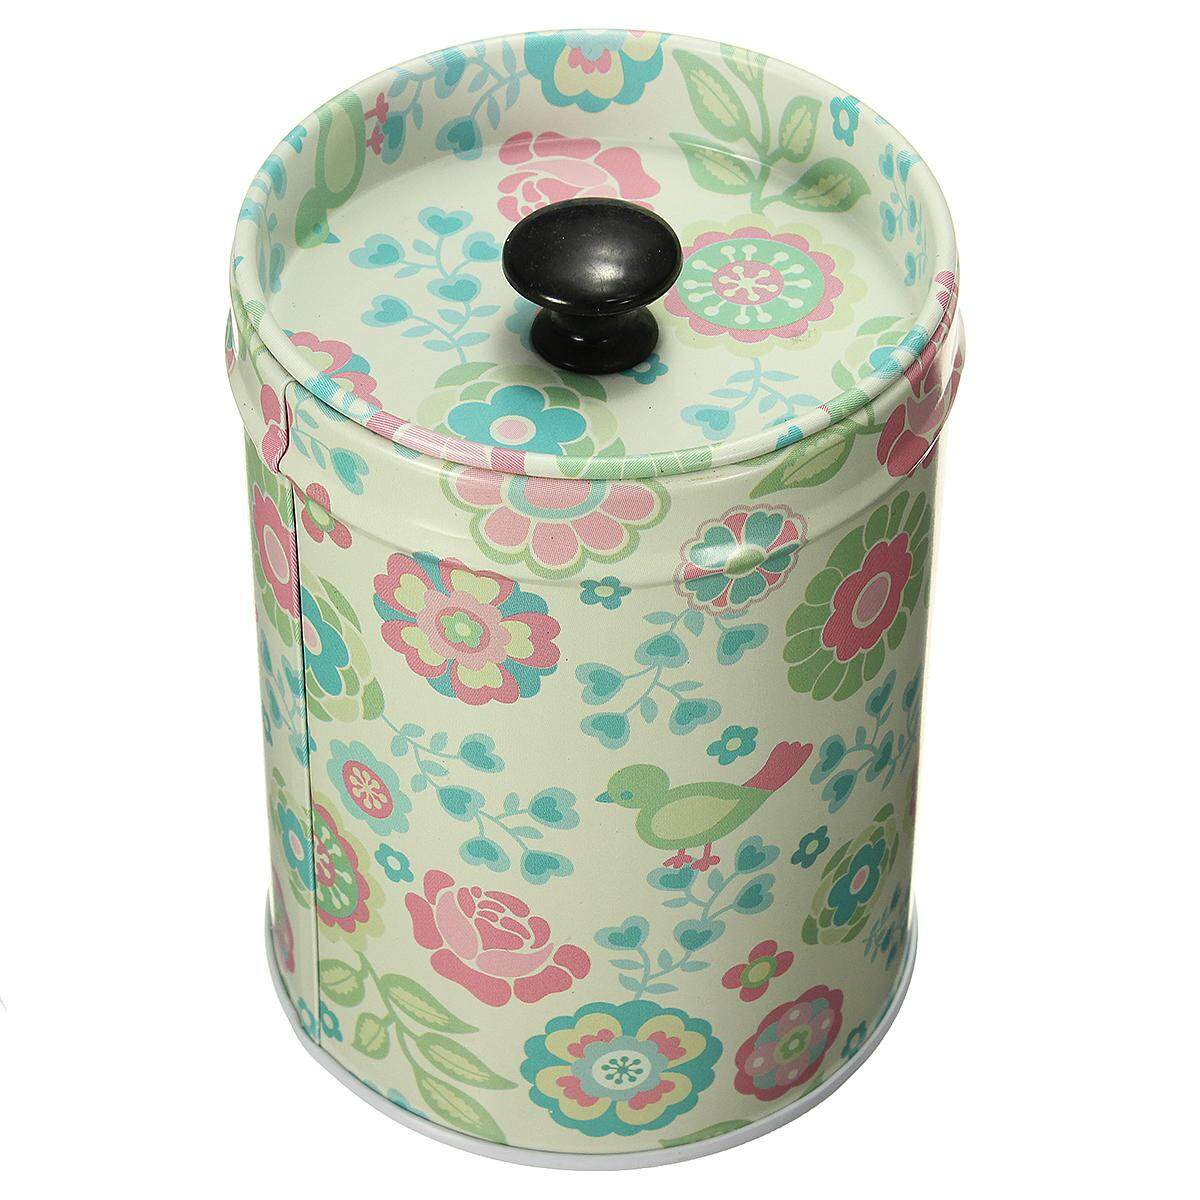 2c84ba043f62 Buy Top Storage Kitchen Canisters | Jars | Lazada